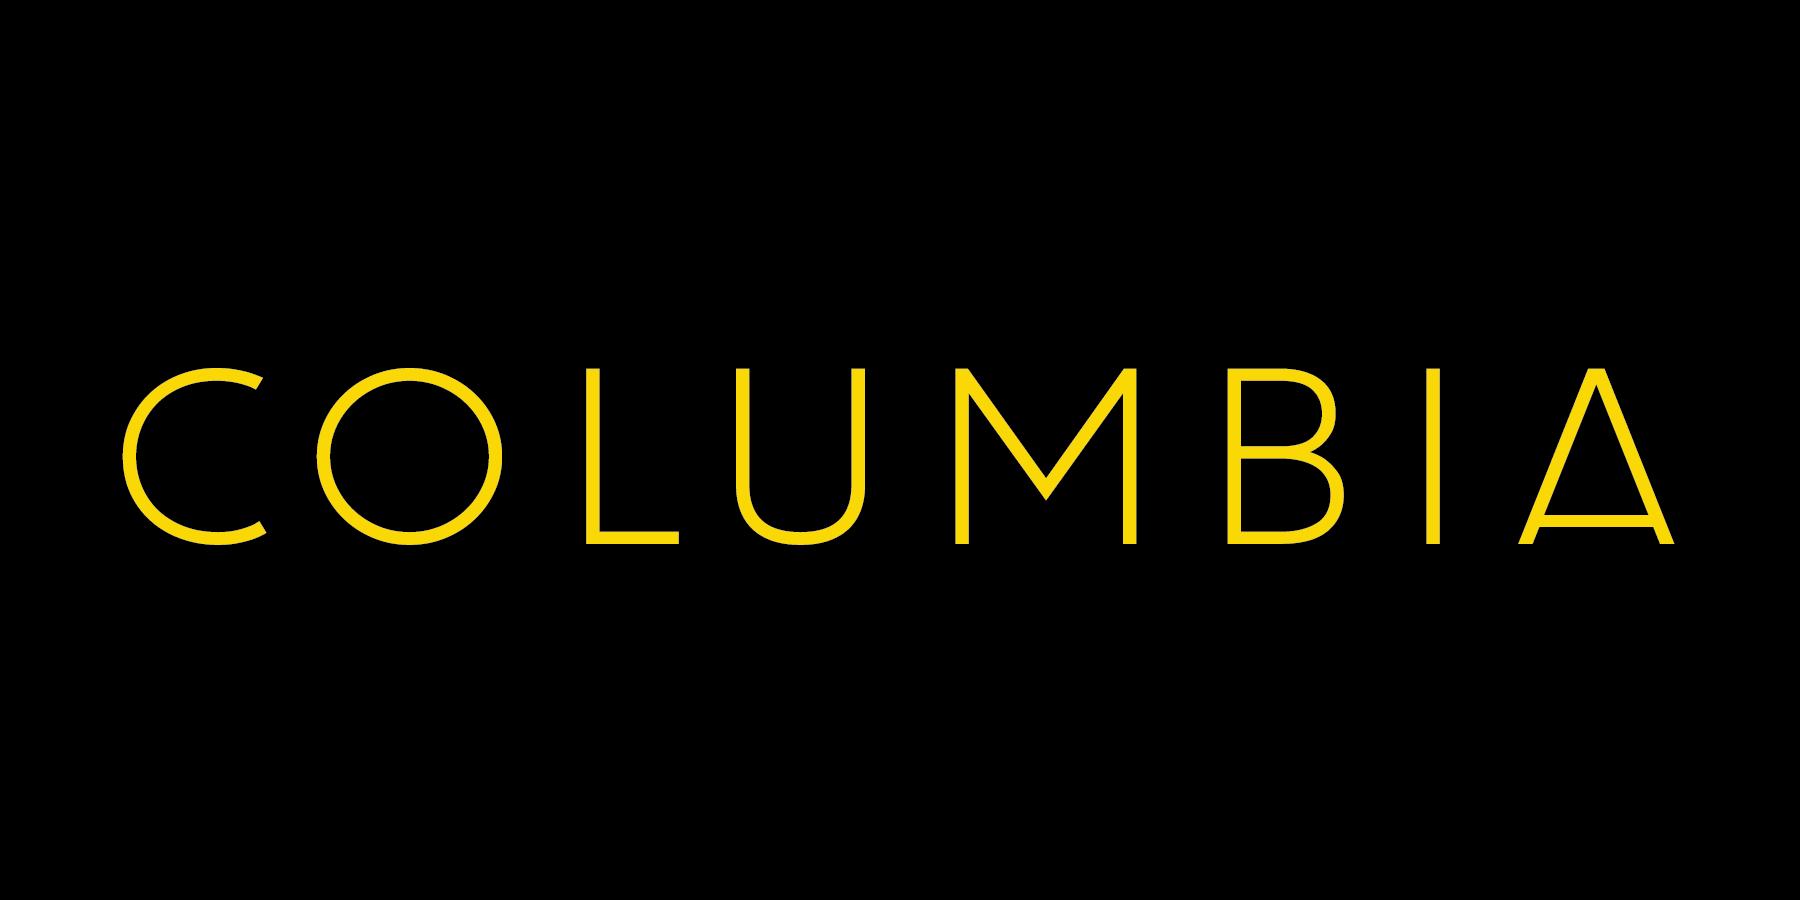 The Columbia_Pantone012